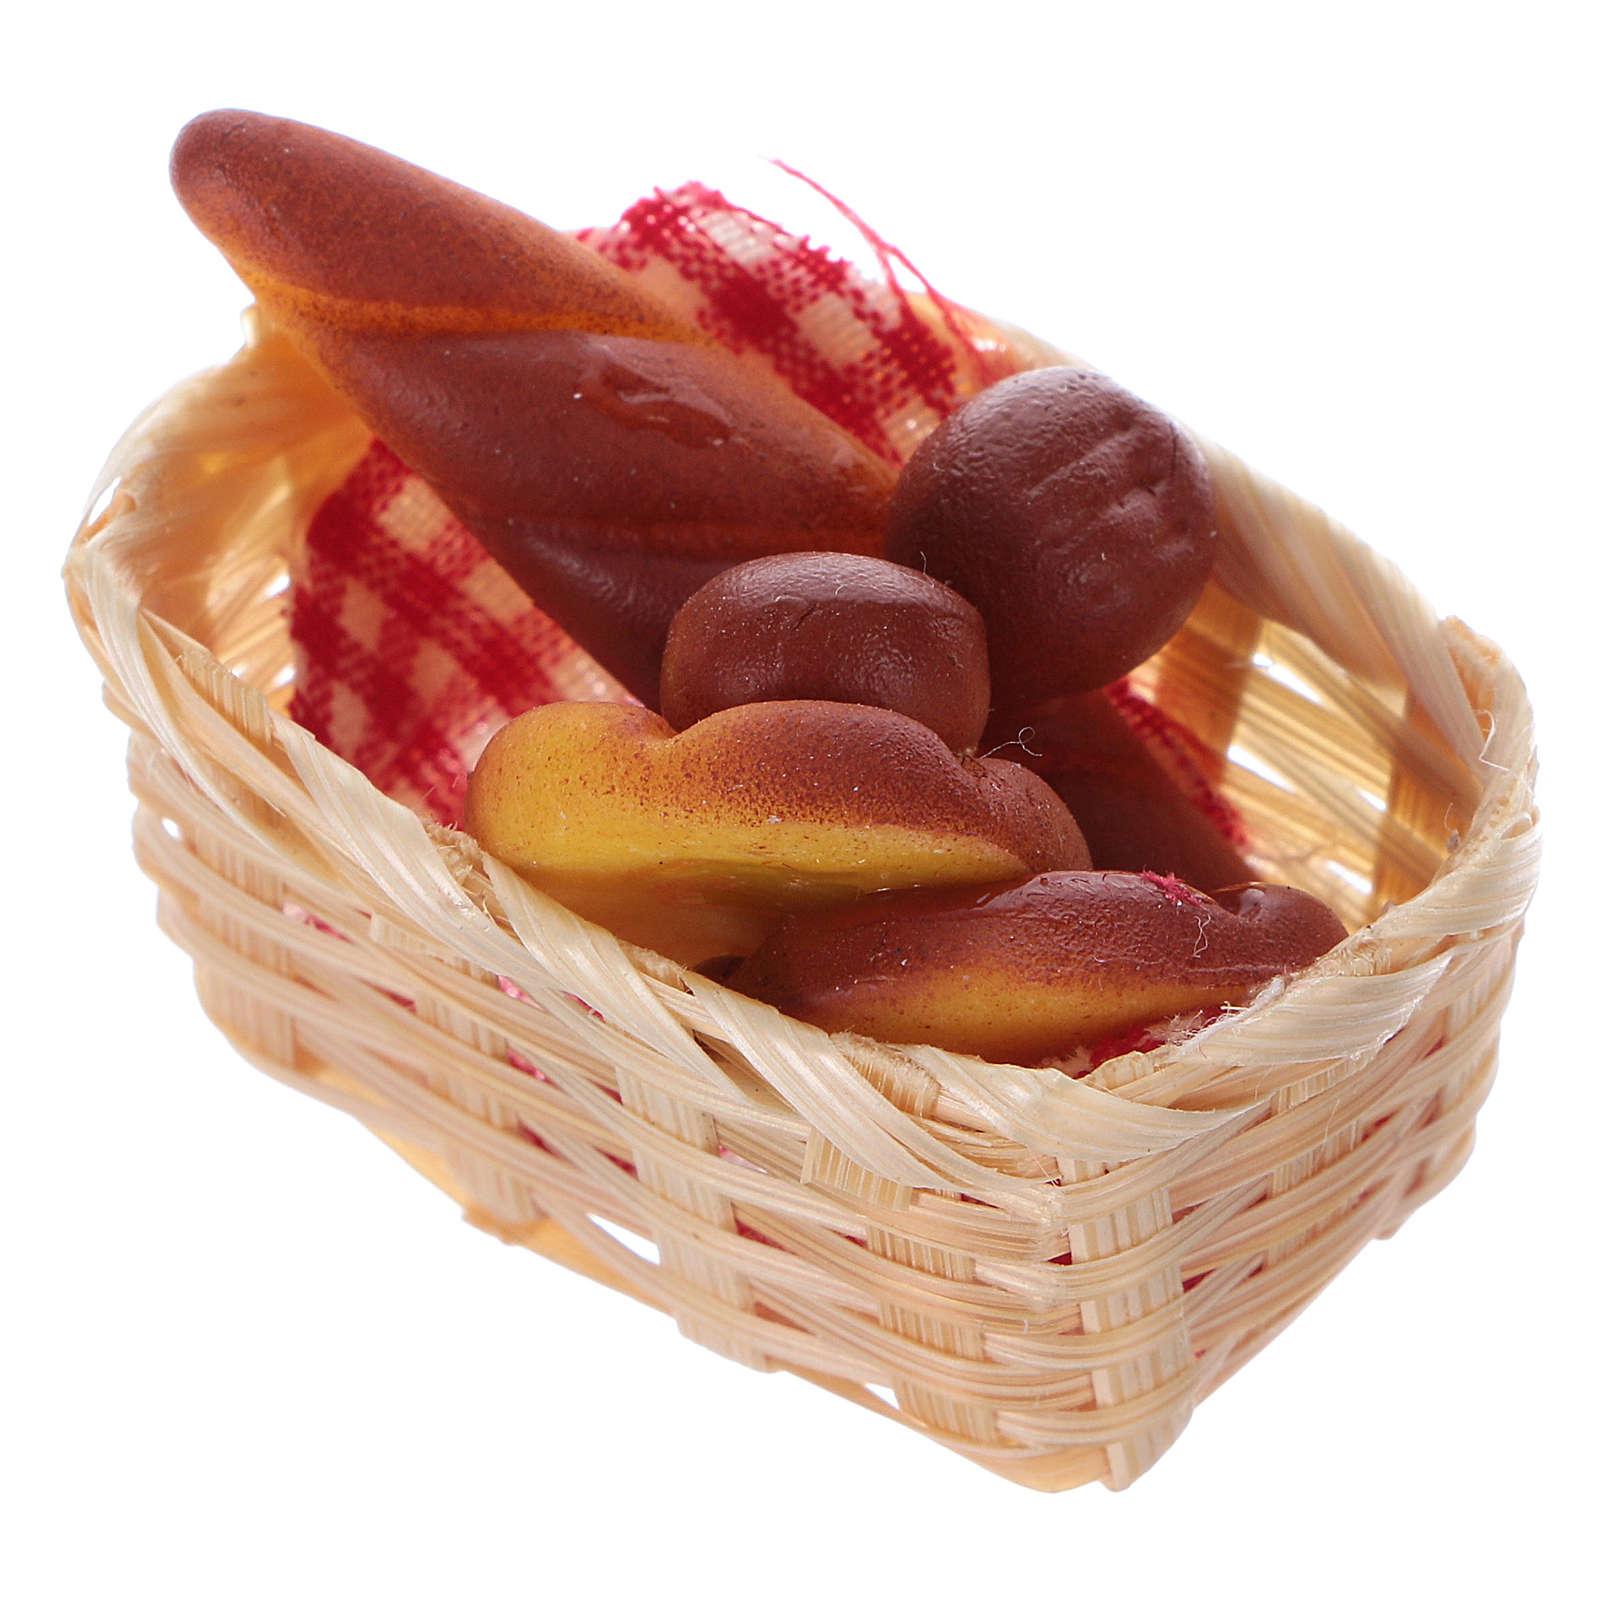 nativity set accessory, wicker basket with bread 4